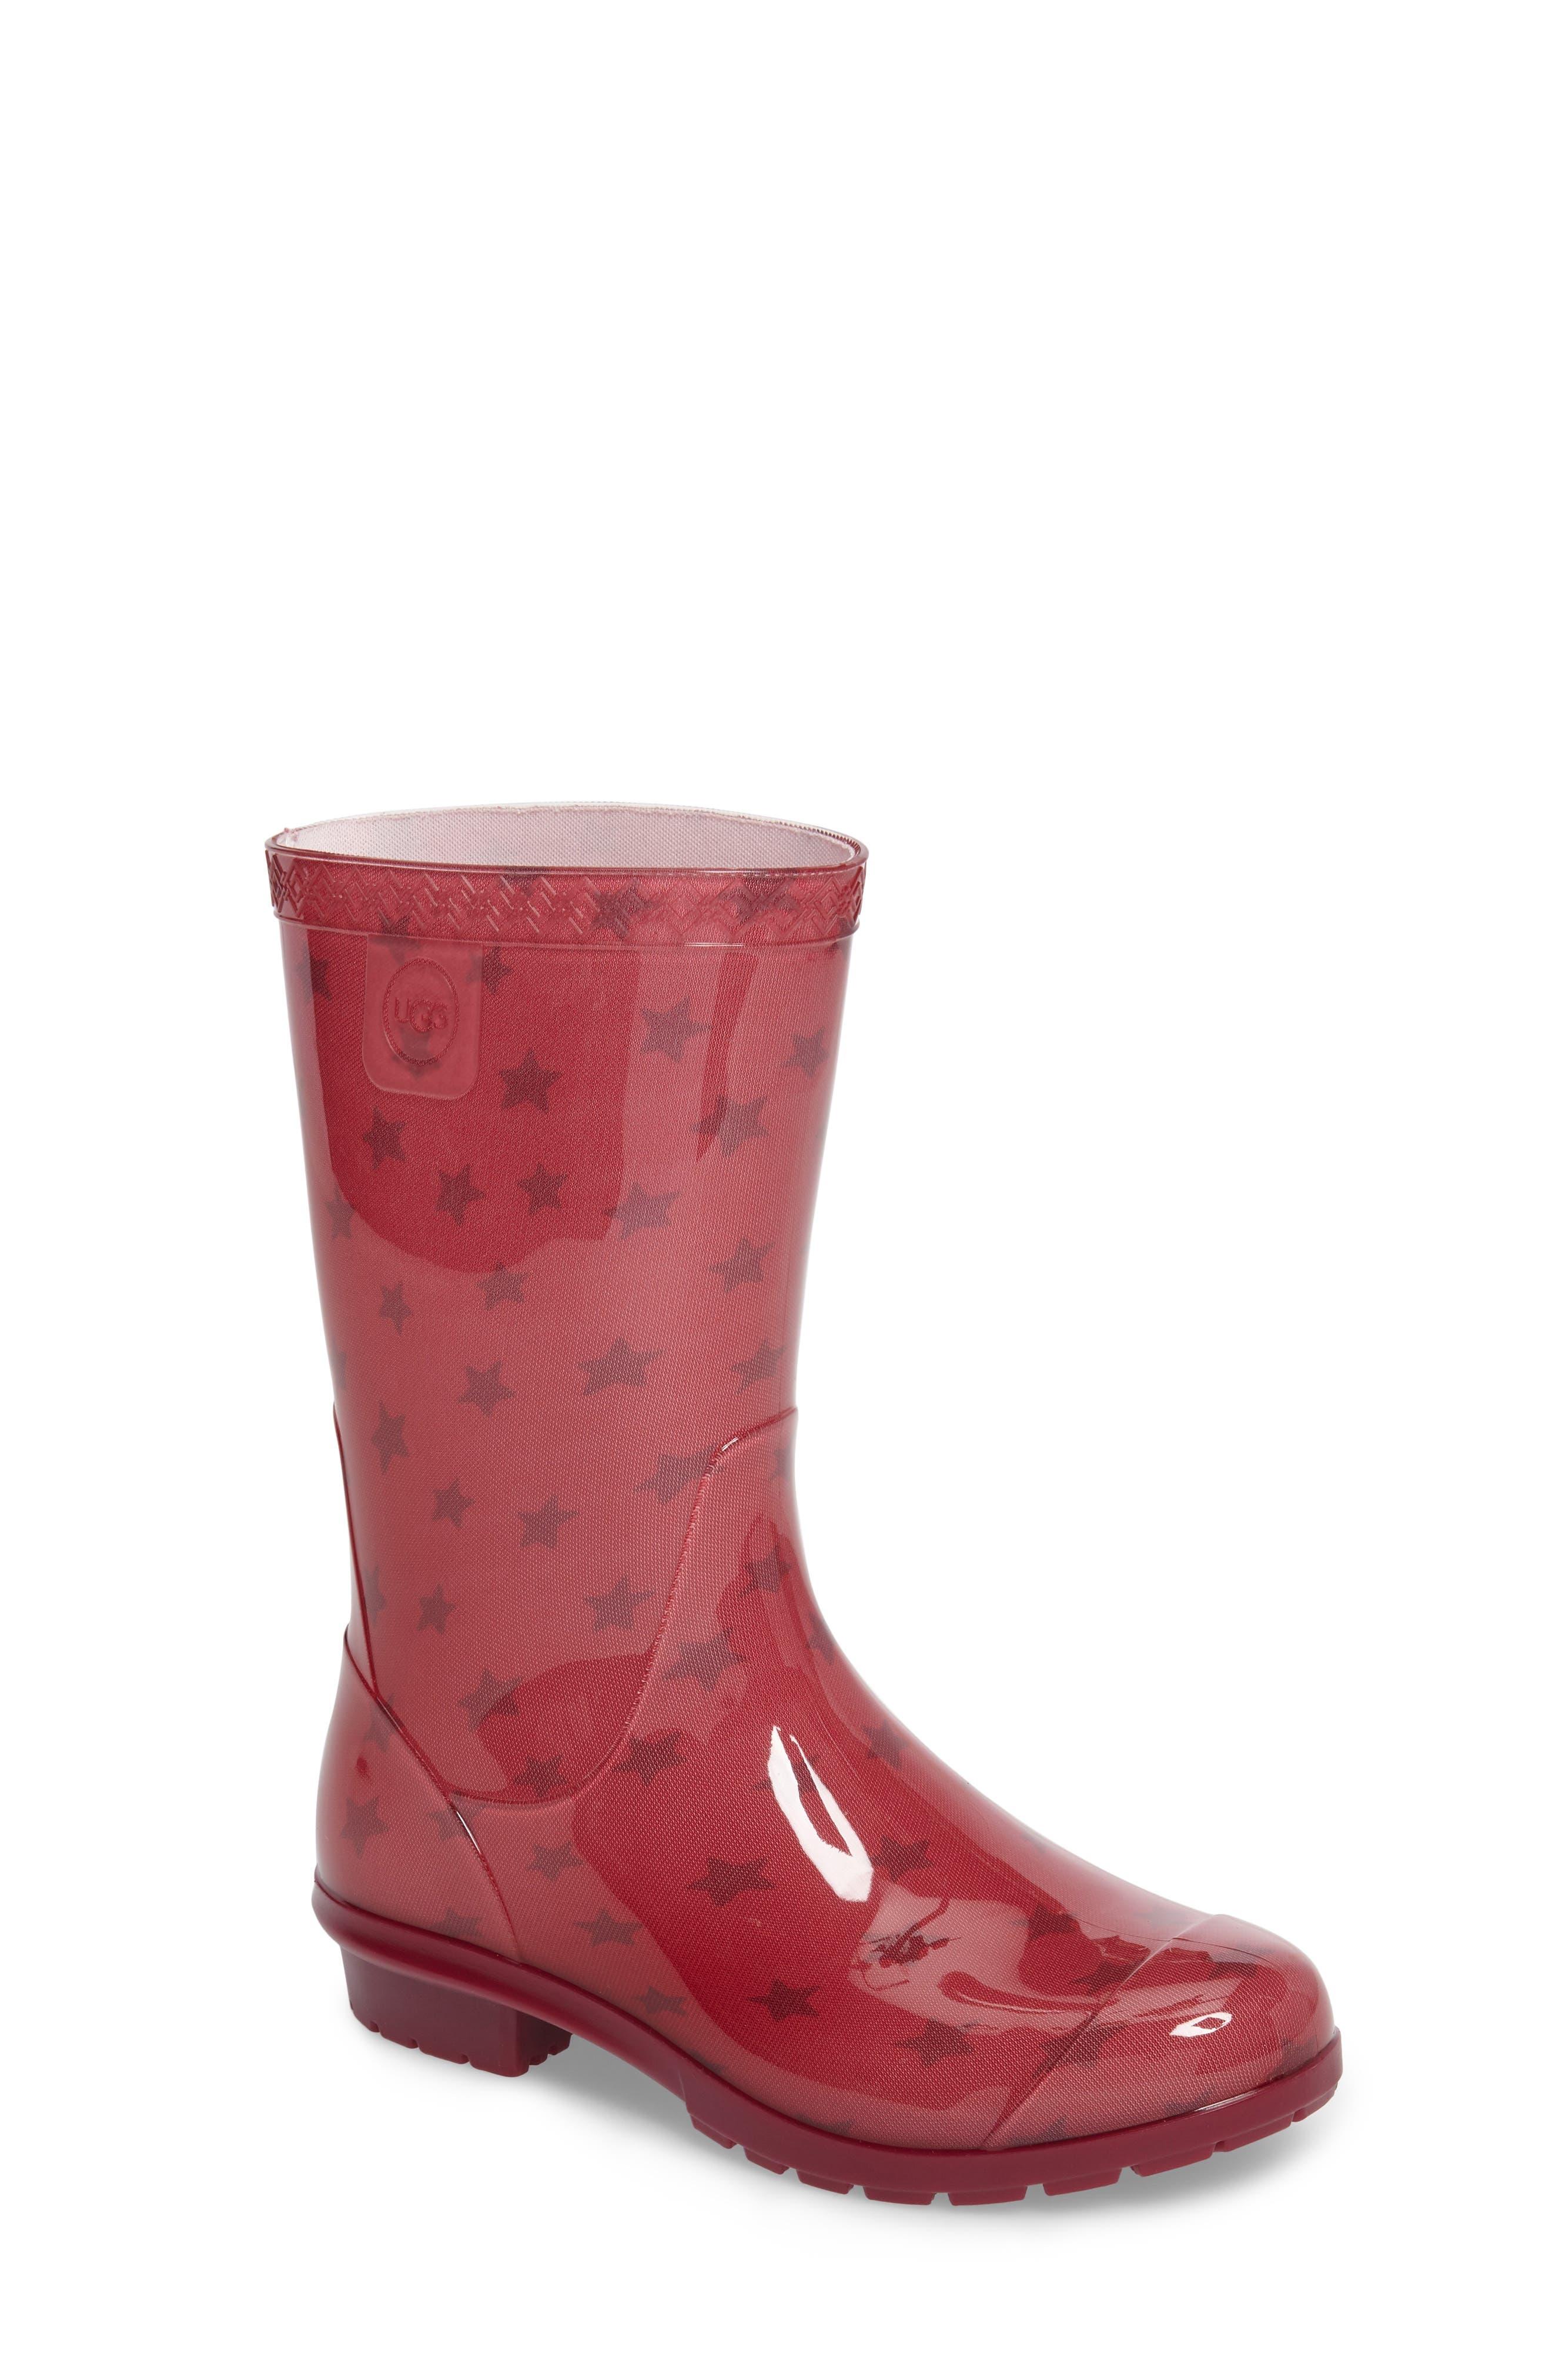 Main Image - UGG® Raana Stars Waterproof Rain Boot (Little Kid & Big Kid)